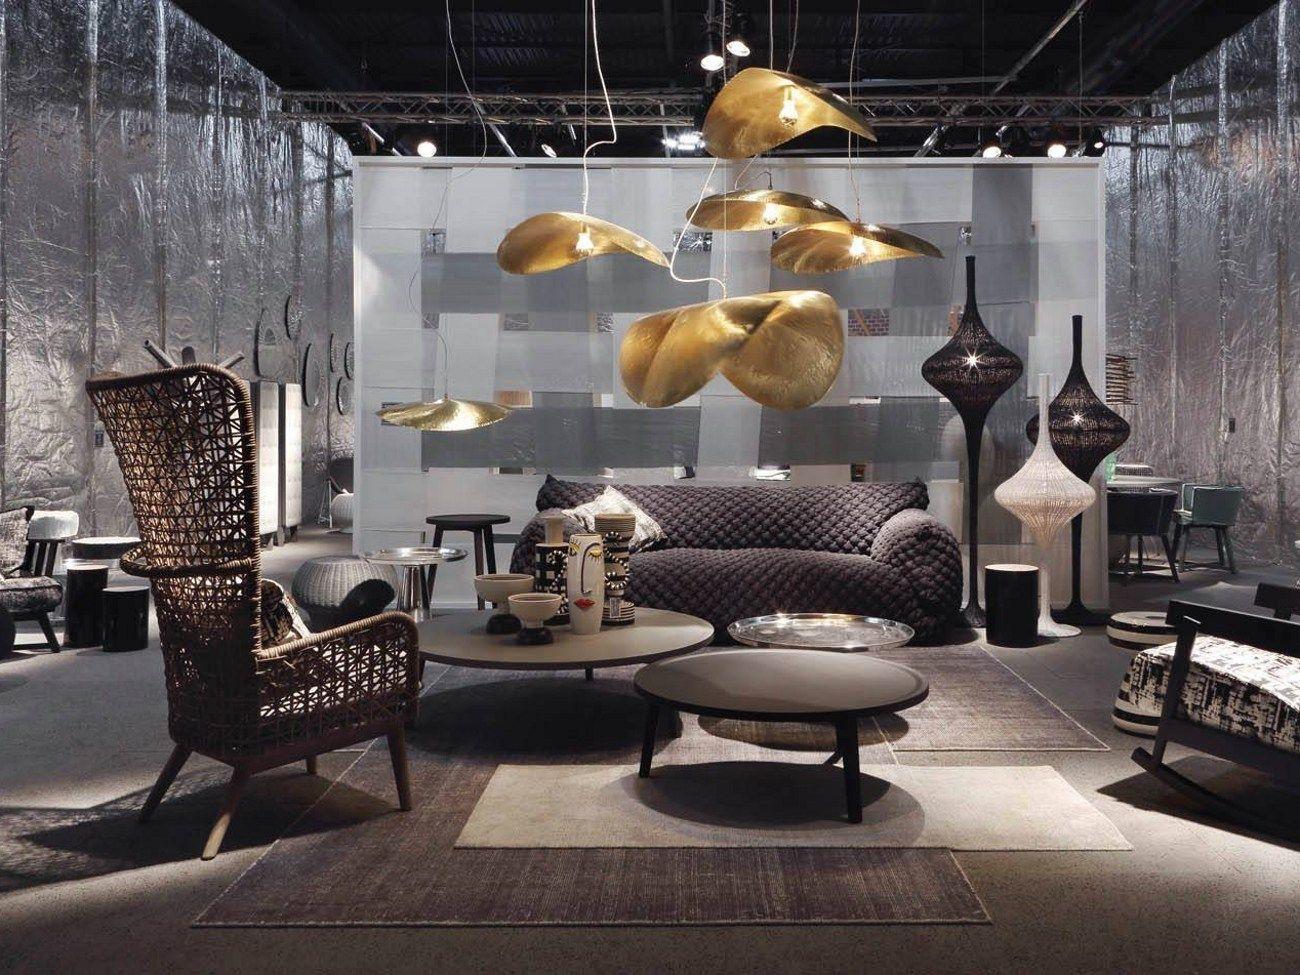 gervasoni with paola navone. Black Bedroom Furniture Sets. Home Design Ideas